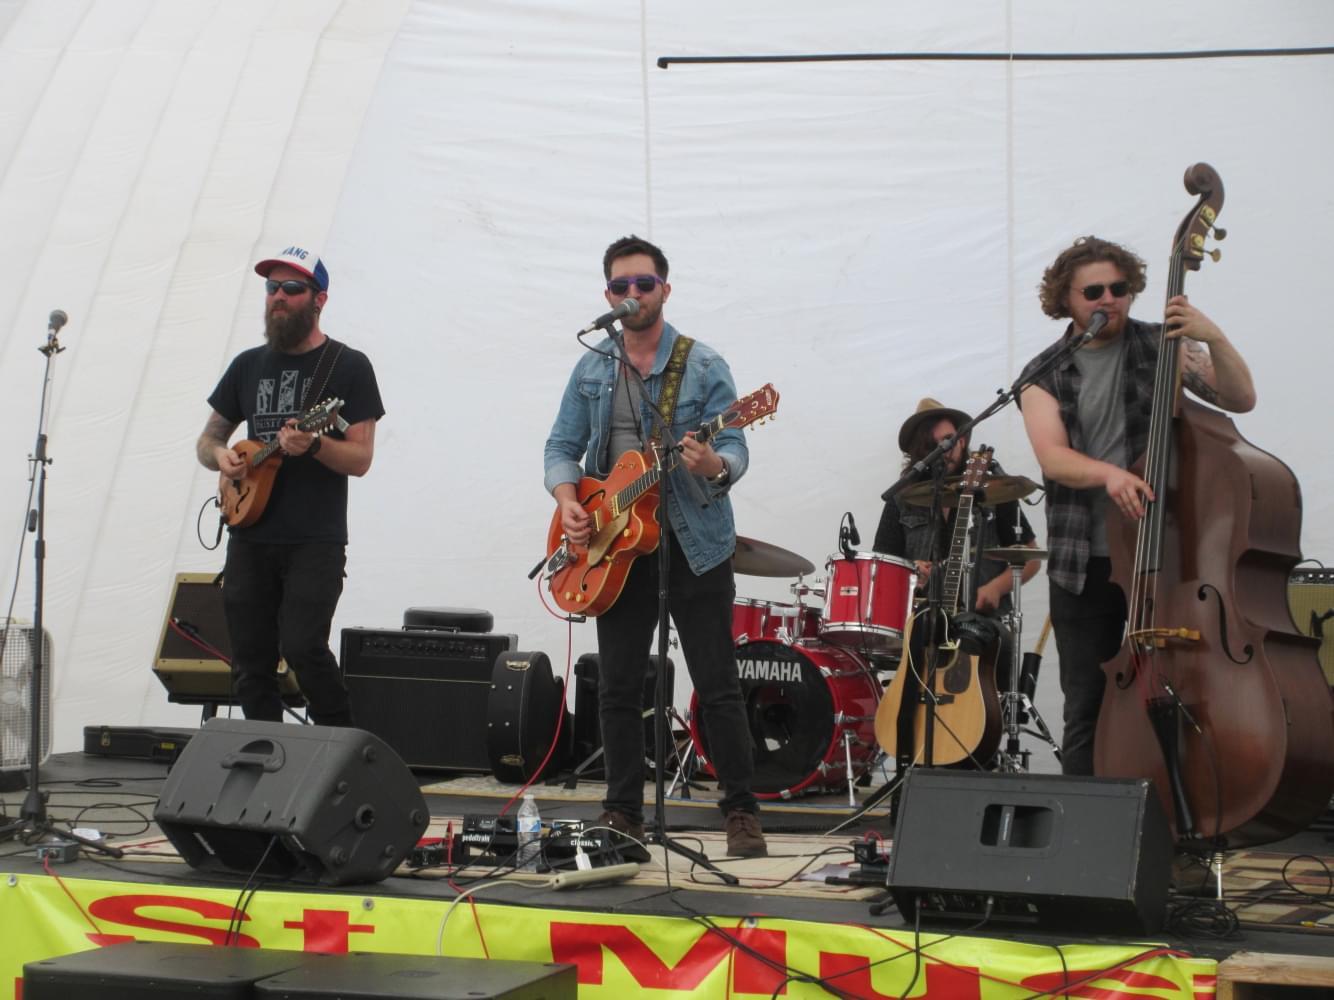 Riverfront Music Revival in Shelton